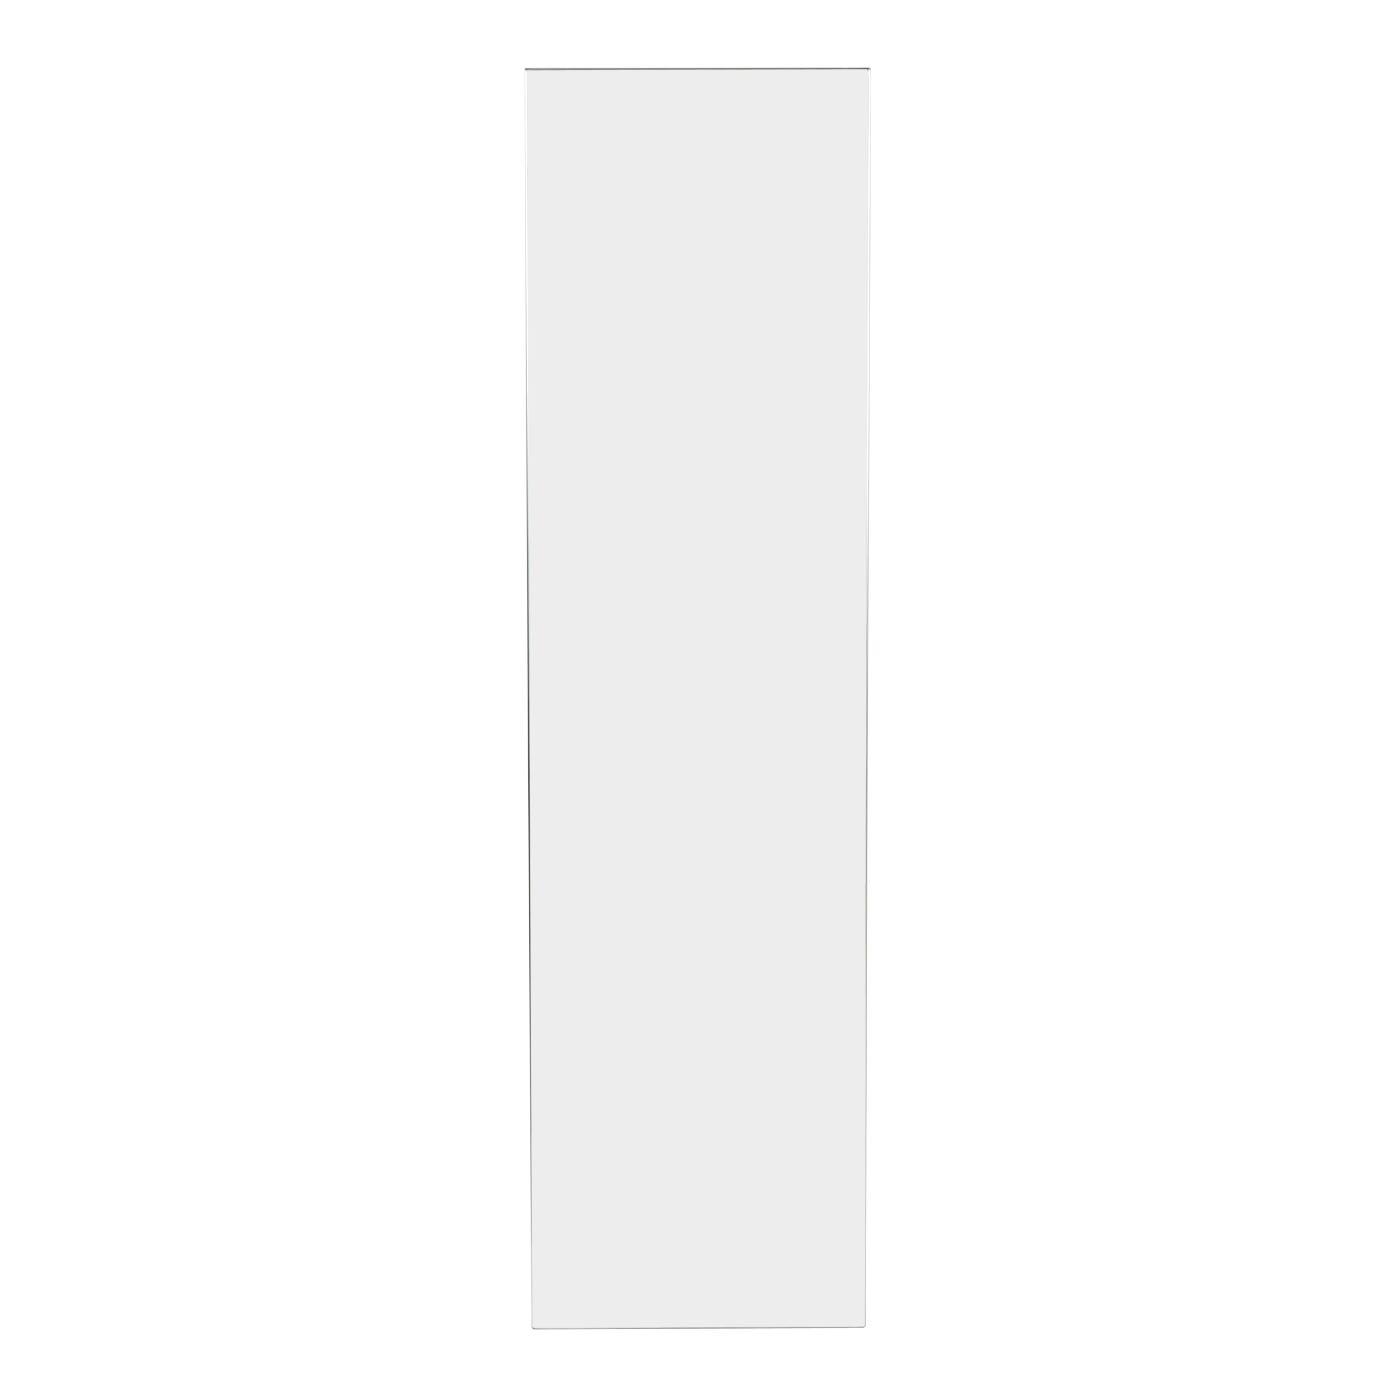 Bevelled Edge Mirror Rectangular Tall